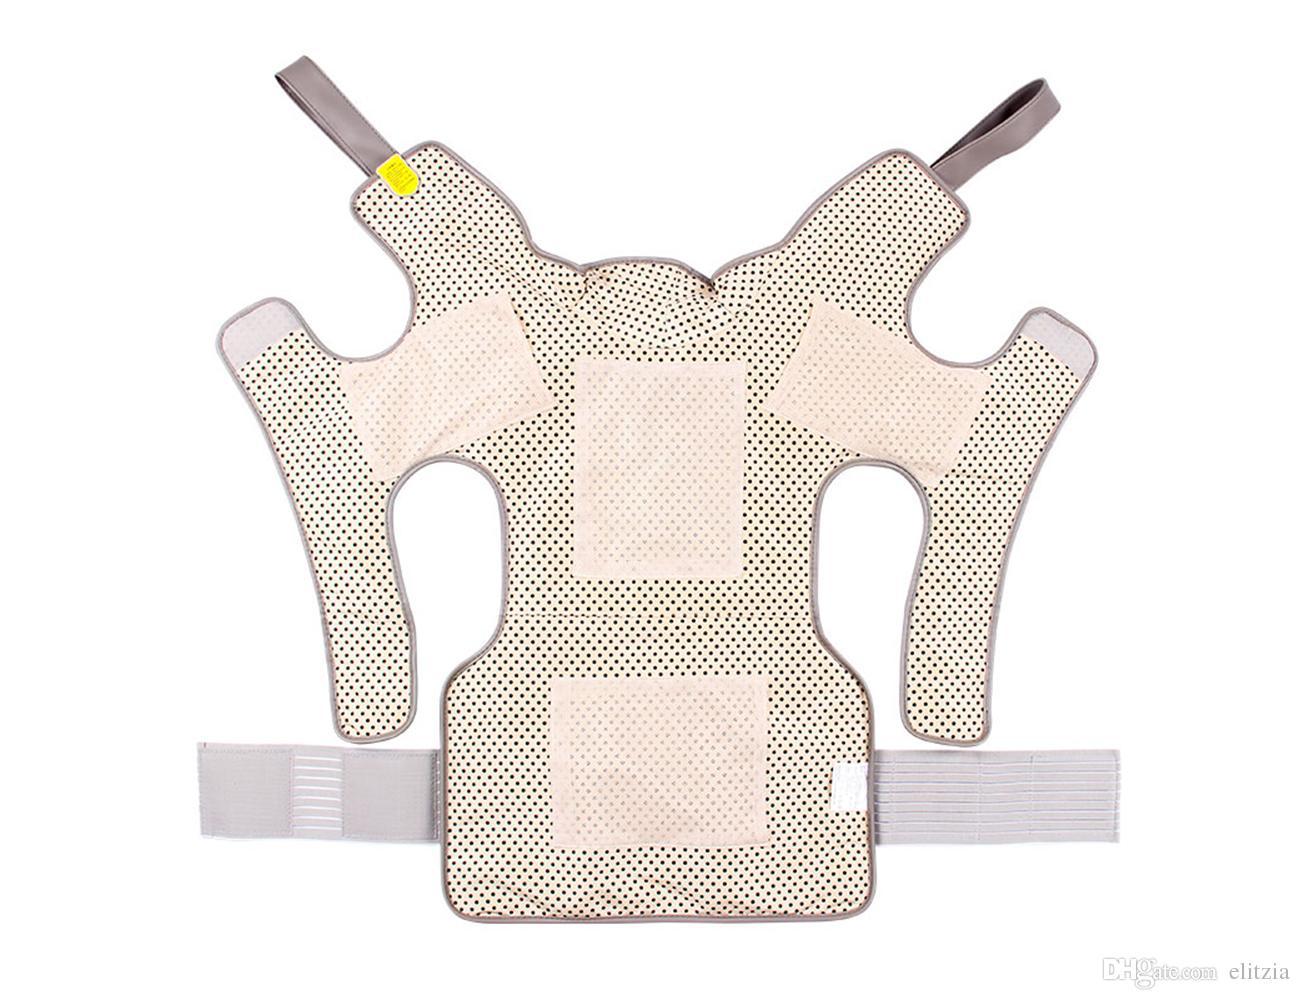 Health Care Massager Vibrator Multifunctional Far Infrared Heating Neck Shoulder Waist And Back Care Massager Elitzia ETHYE102